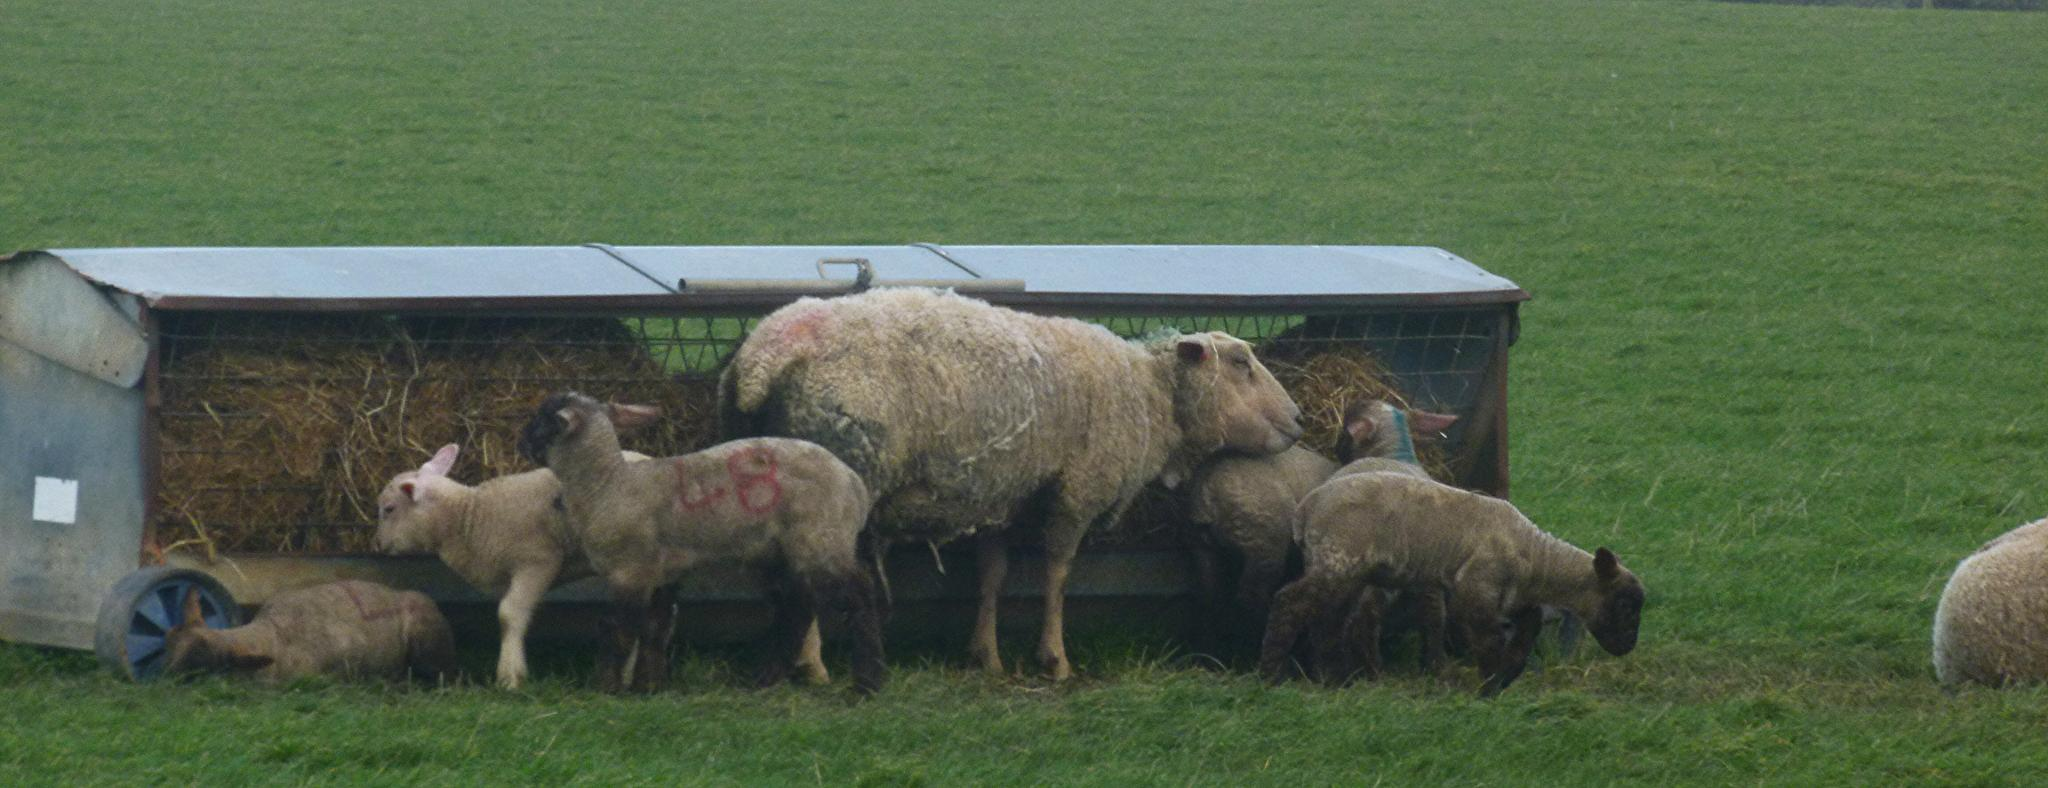 sheep by chris.adams.3557